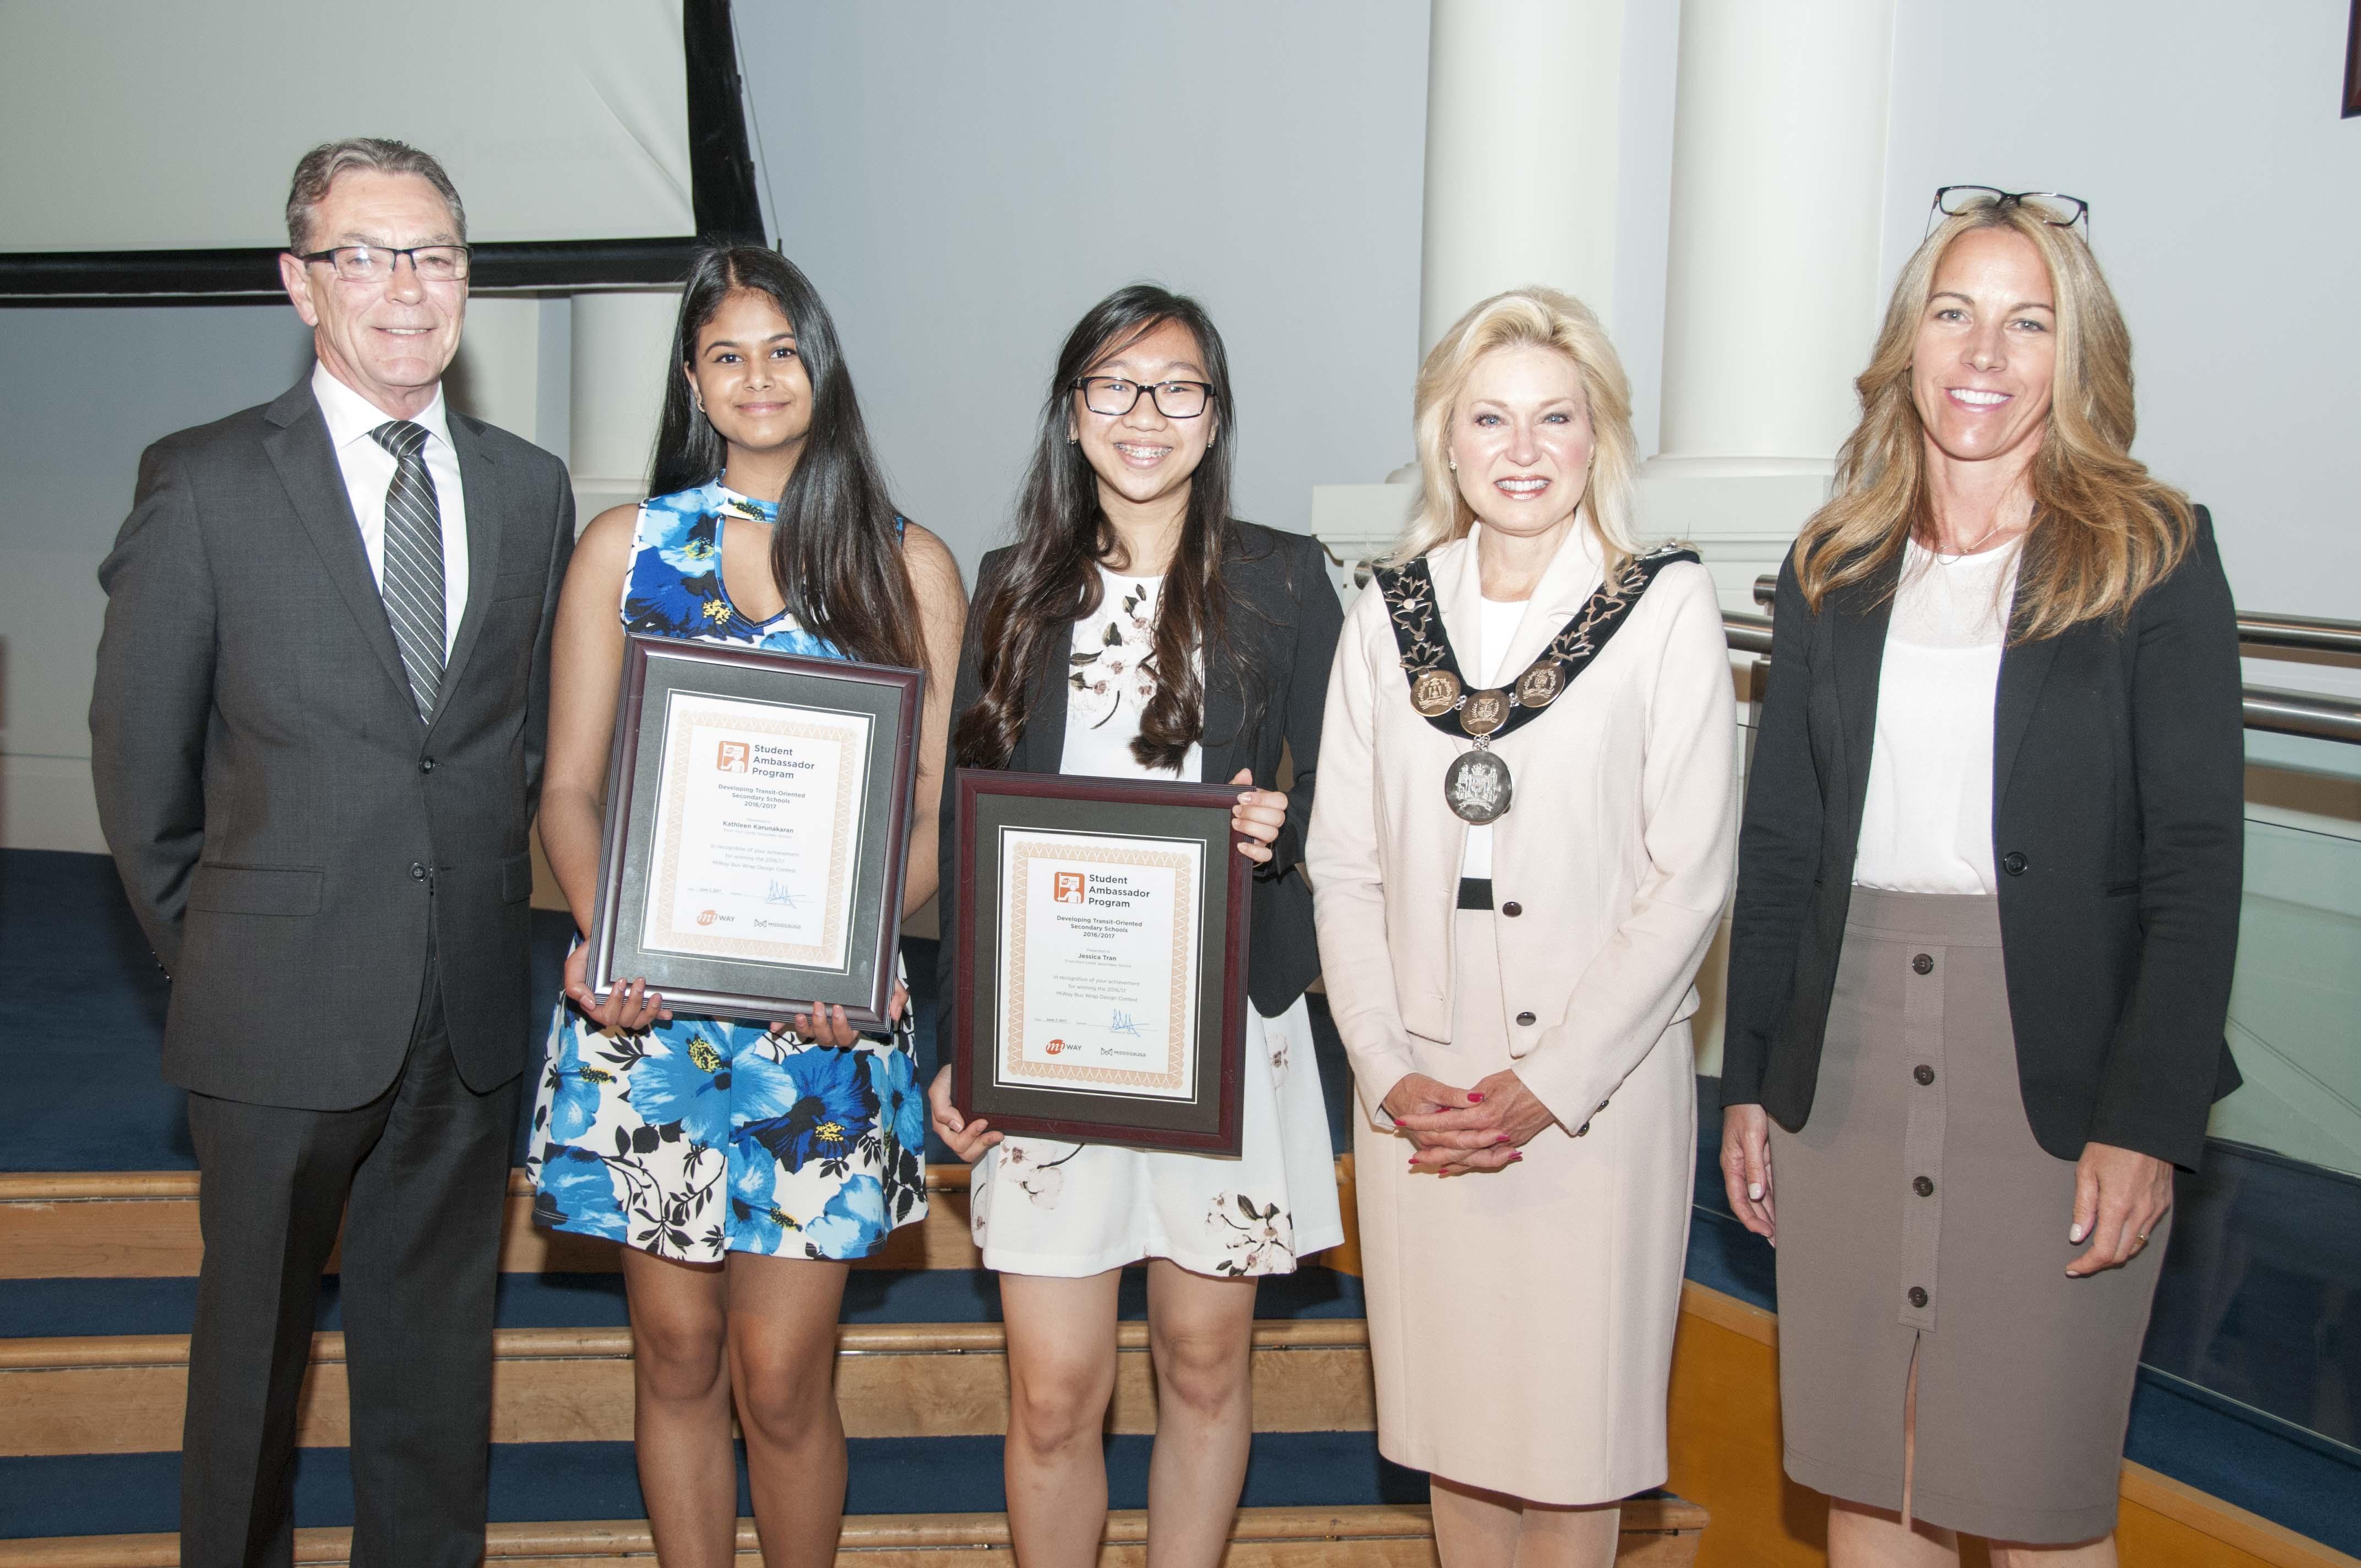 MiWay Student Ambassador Program Winner